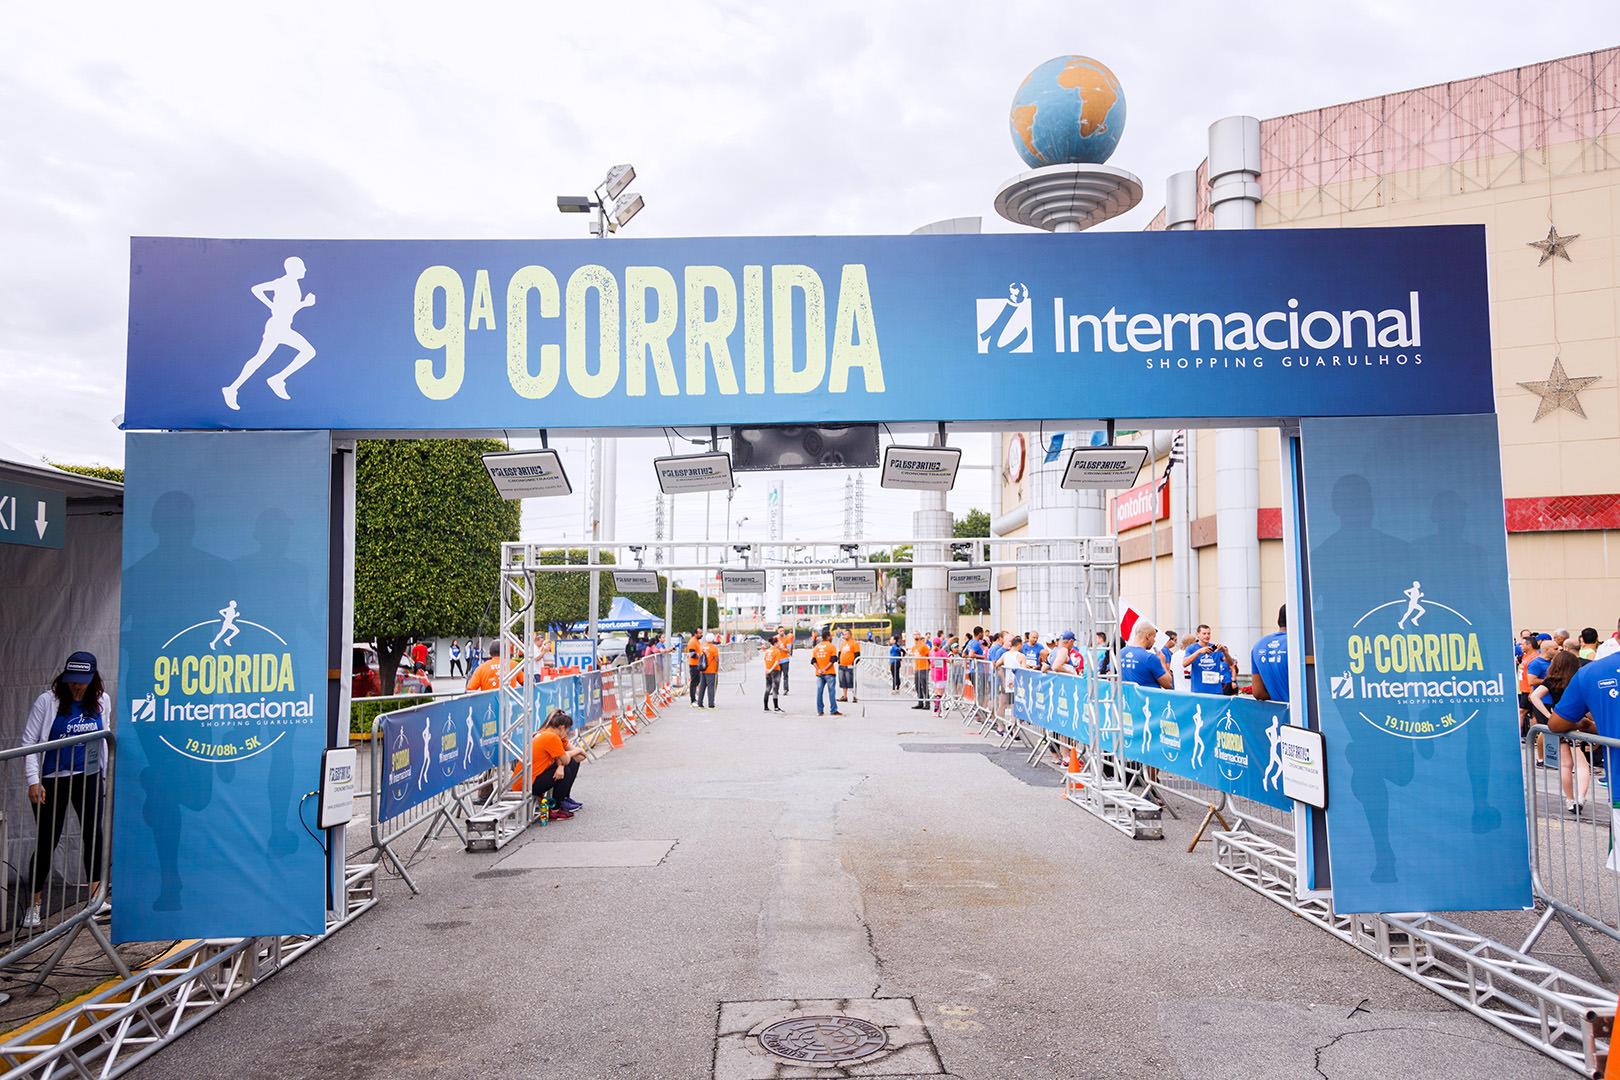 9-corrida-internacional-11